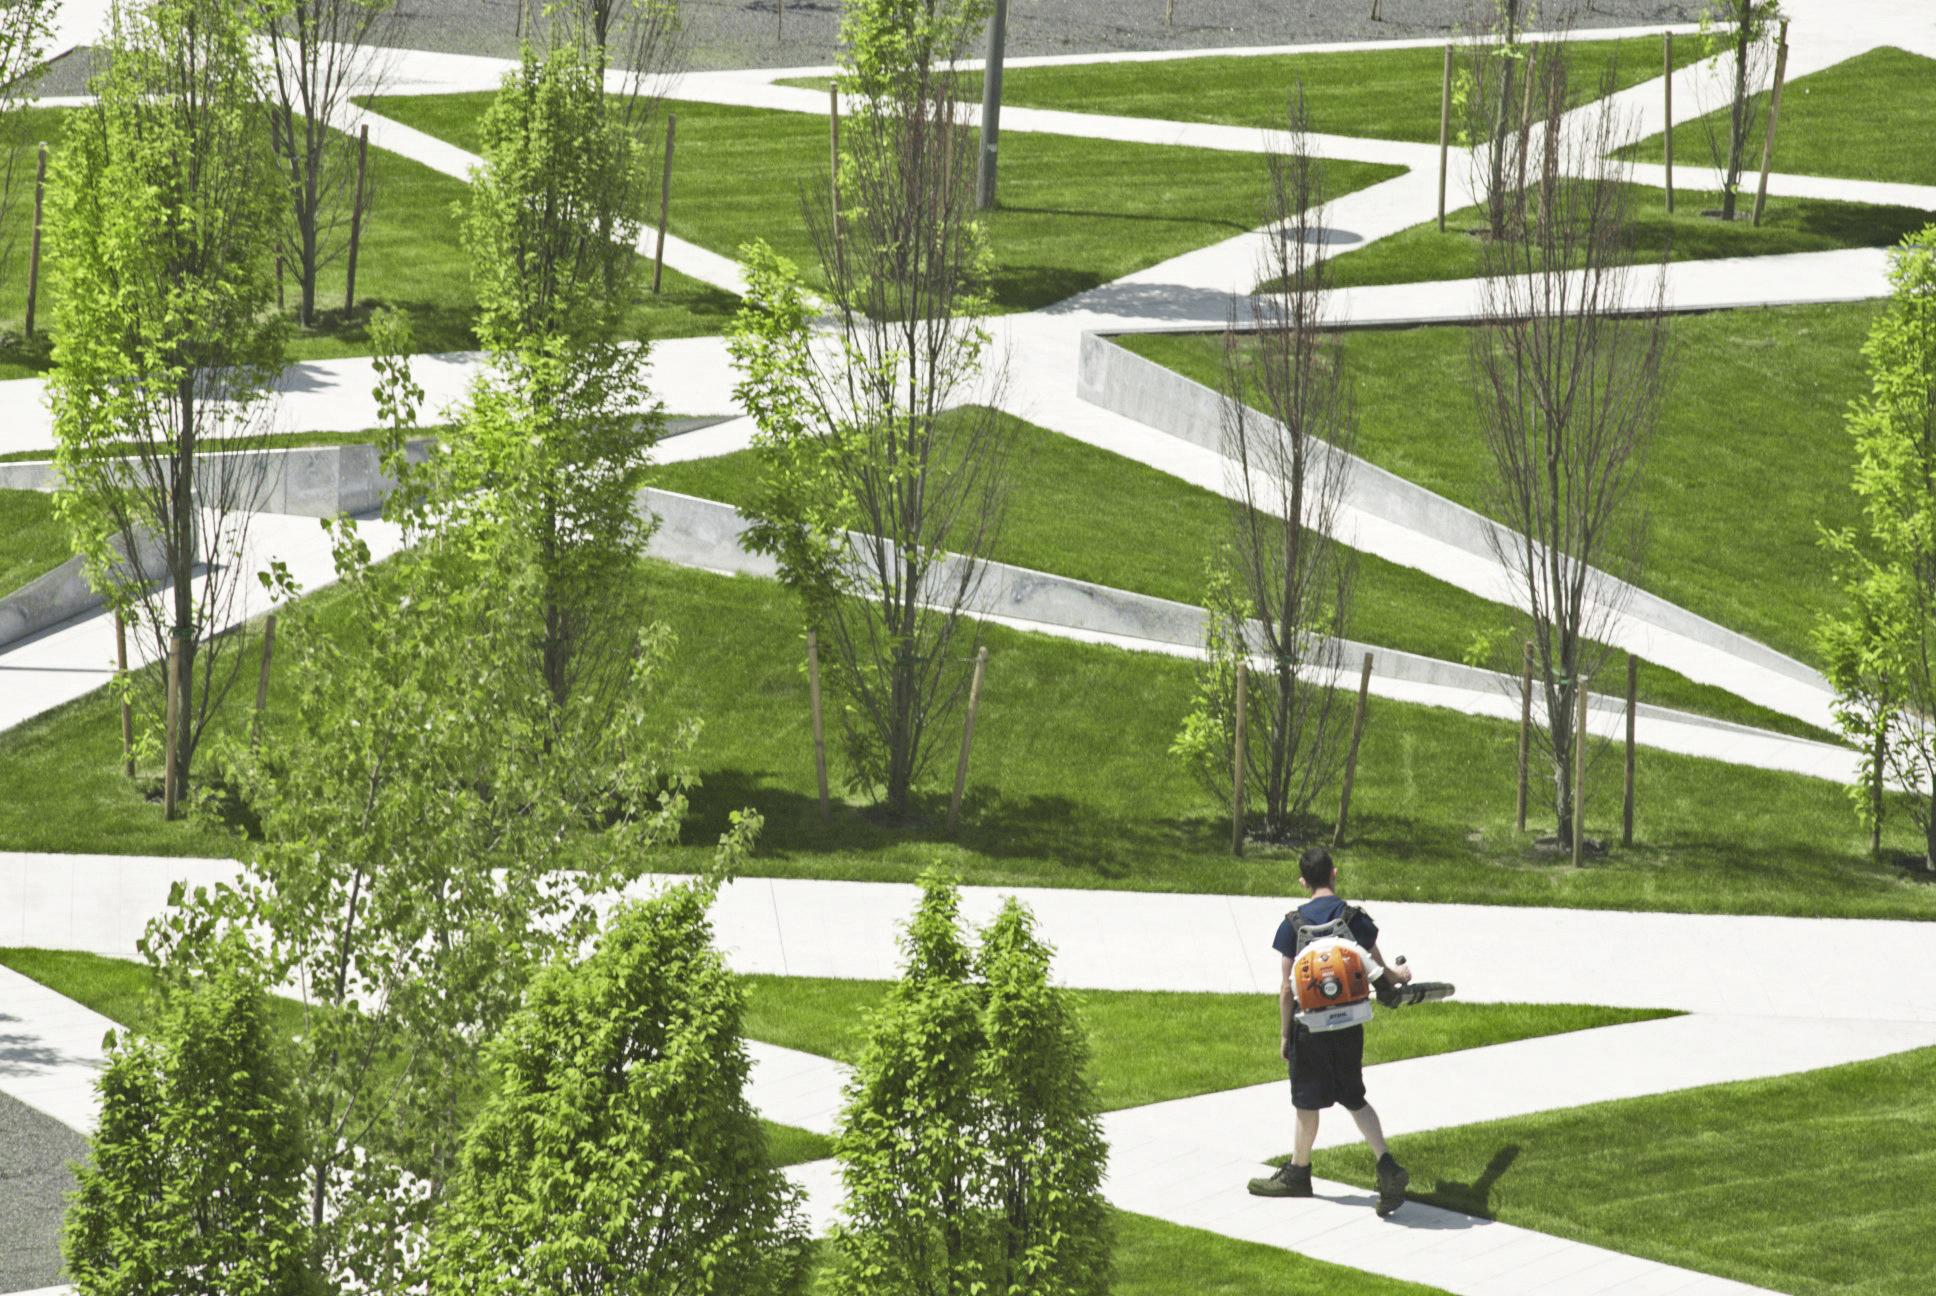 Scholars Green - grass pathway trees